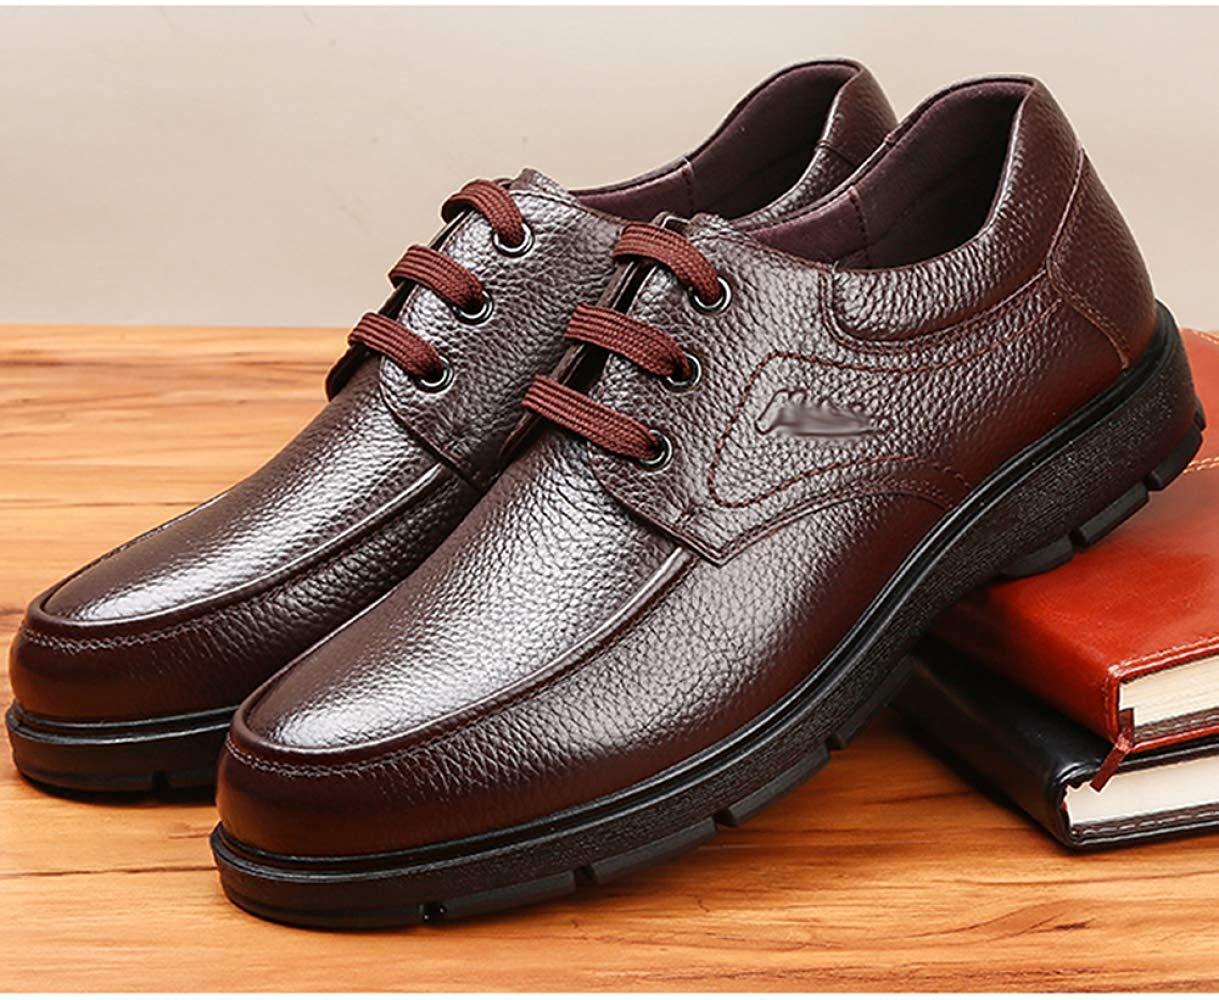 FuweiEncore FuweiEncore FuweiEncore Herren Schnürschuhe Oxford Business Casual Schuhe Komfortable Dämpfung (Farbe   Braun, Größe   43EU) aee51b